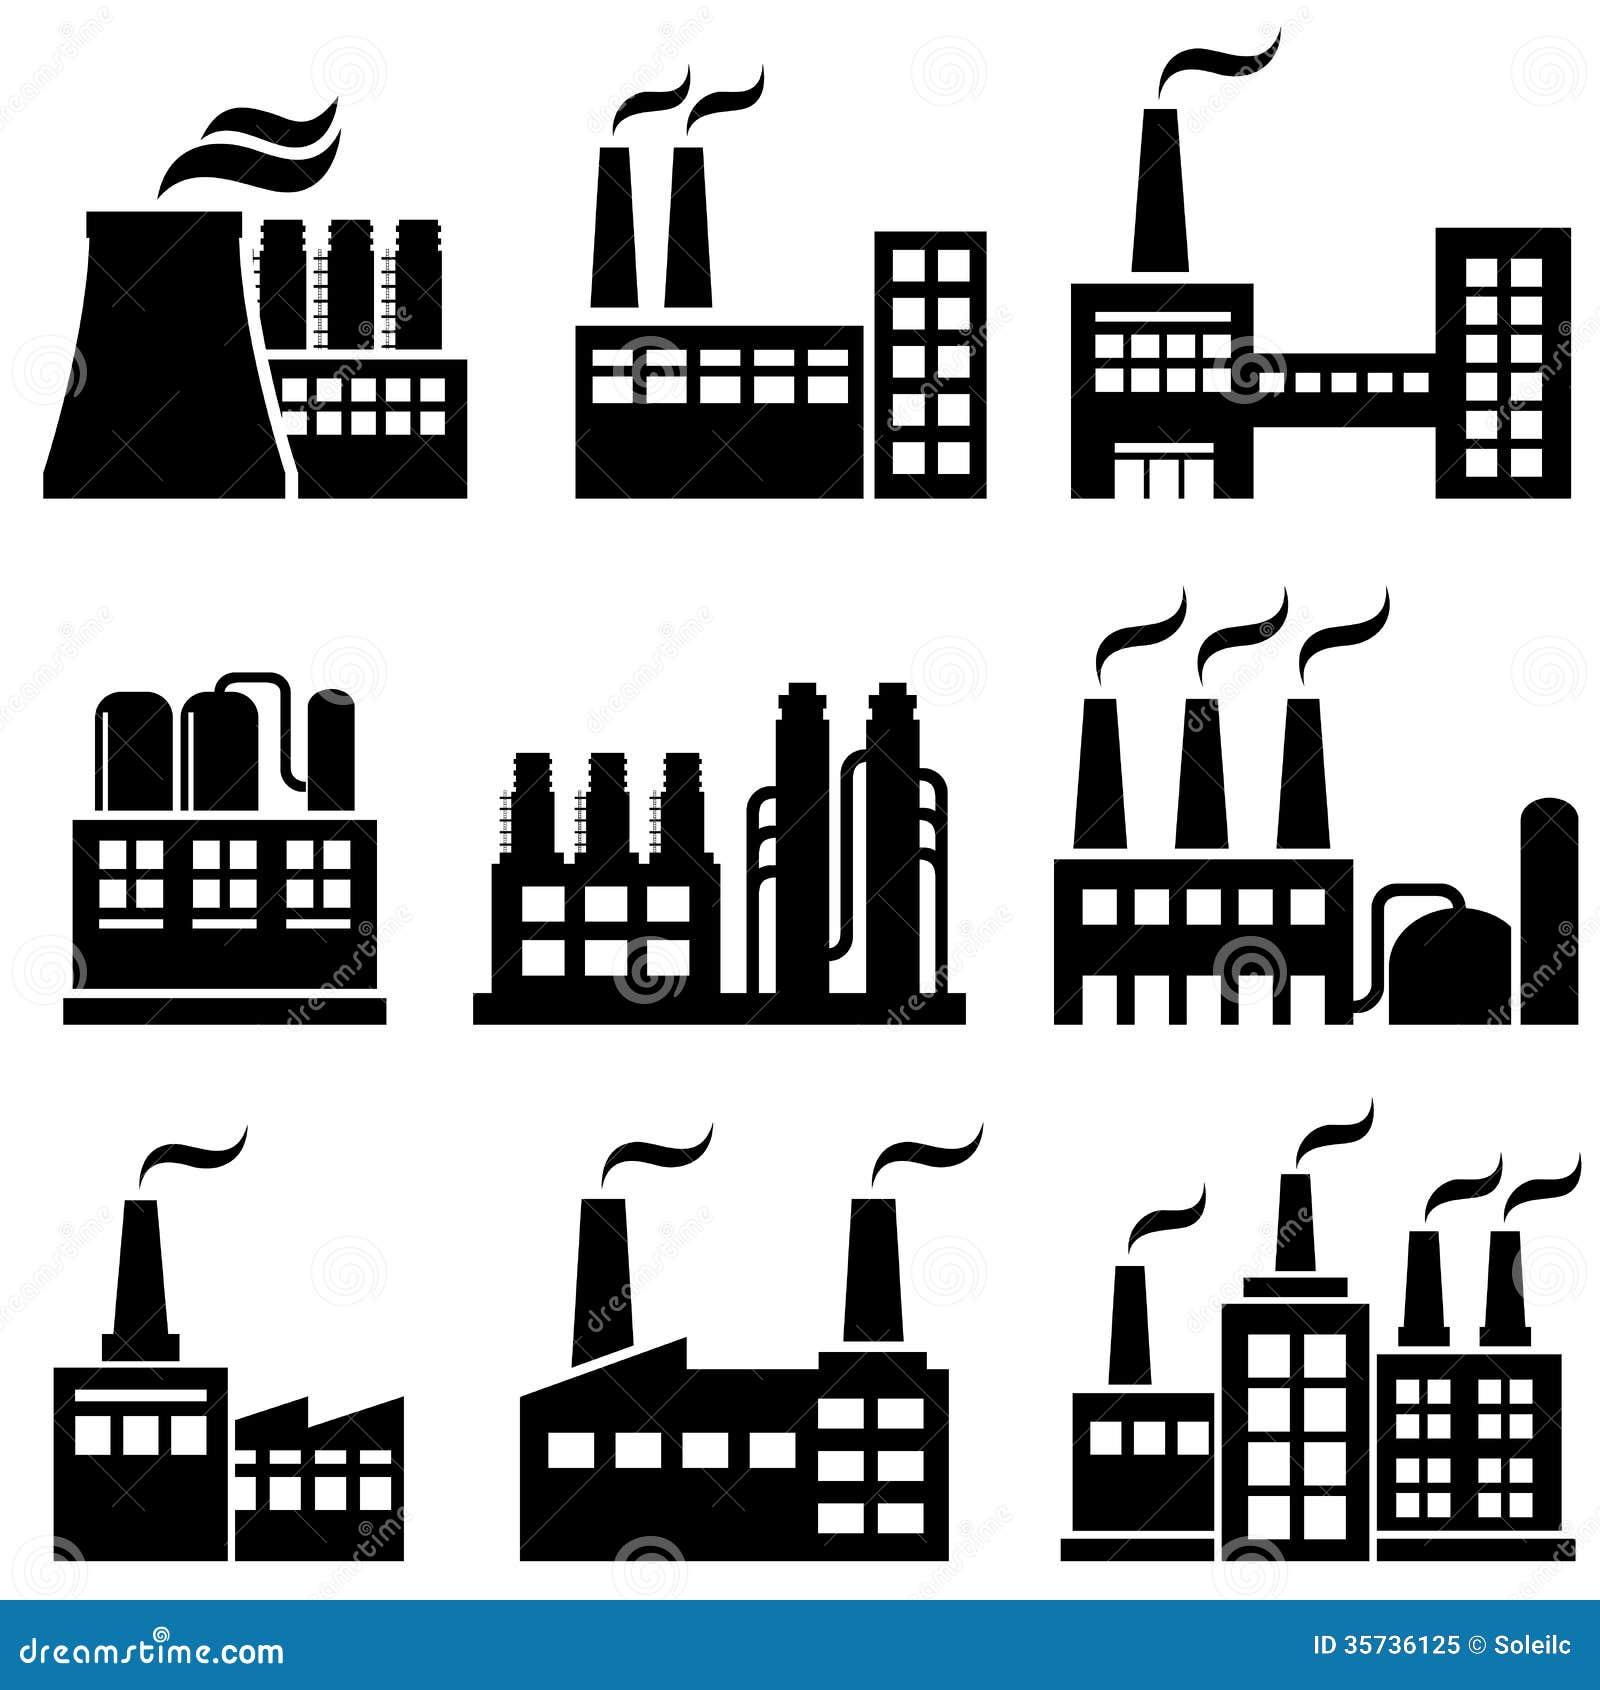 clipart industrial equipment - photo #33